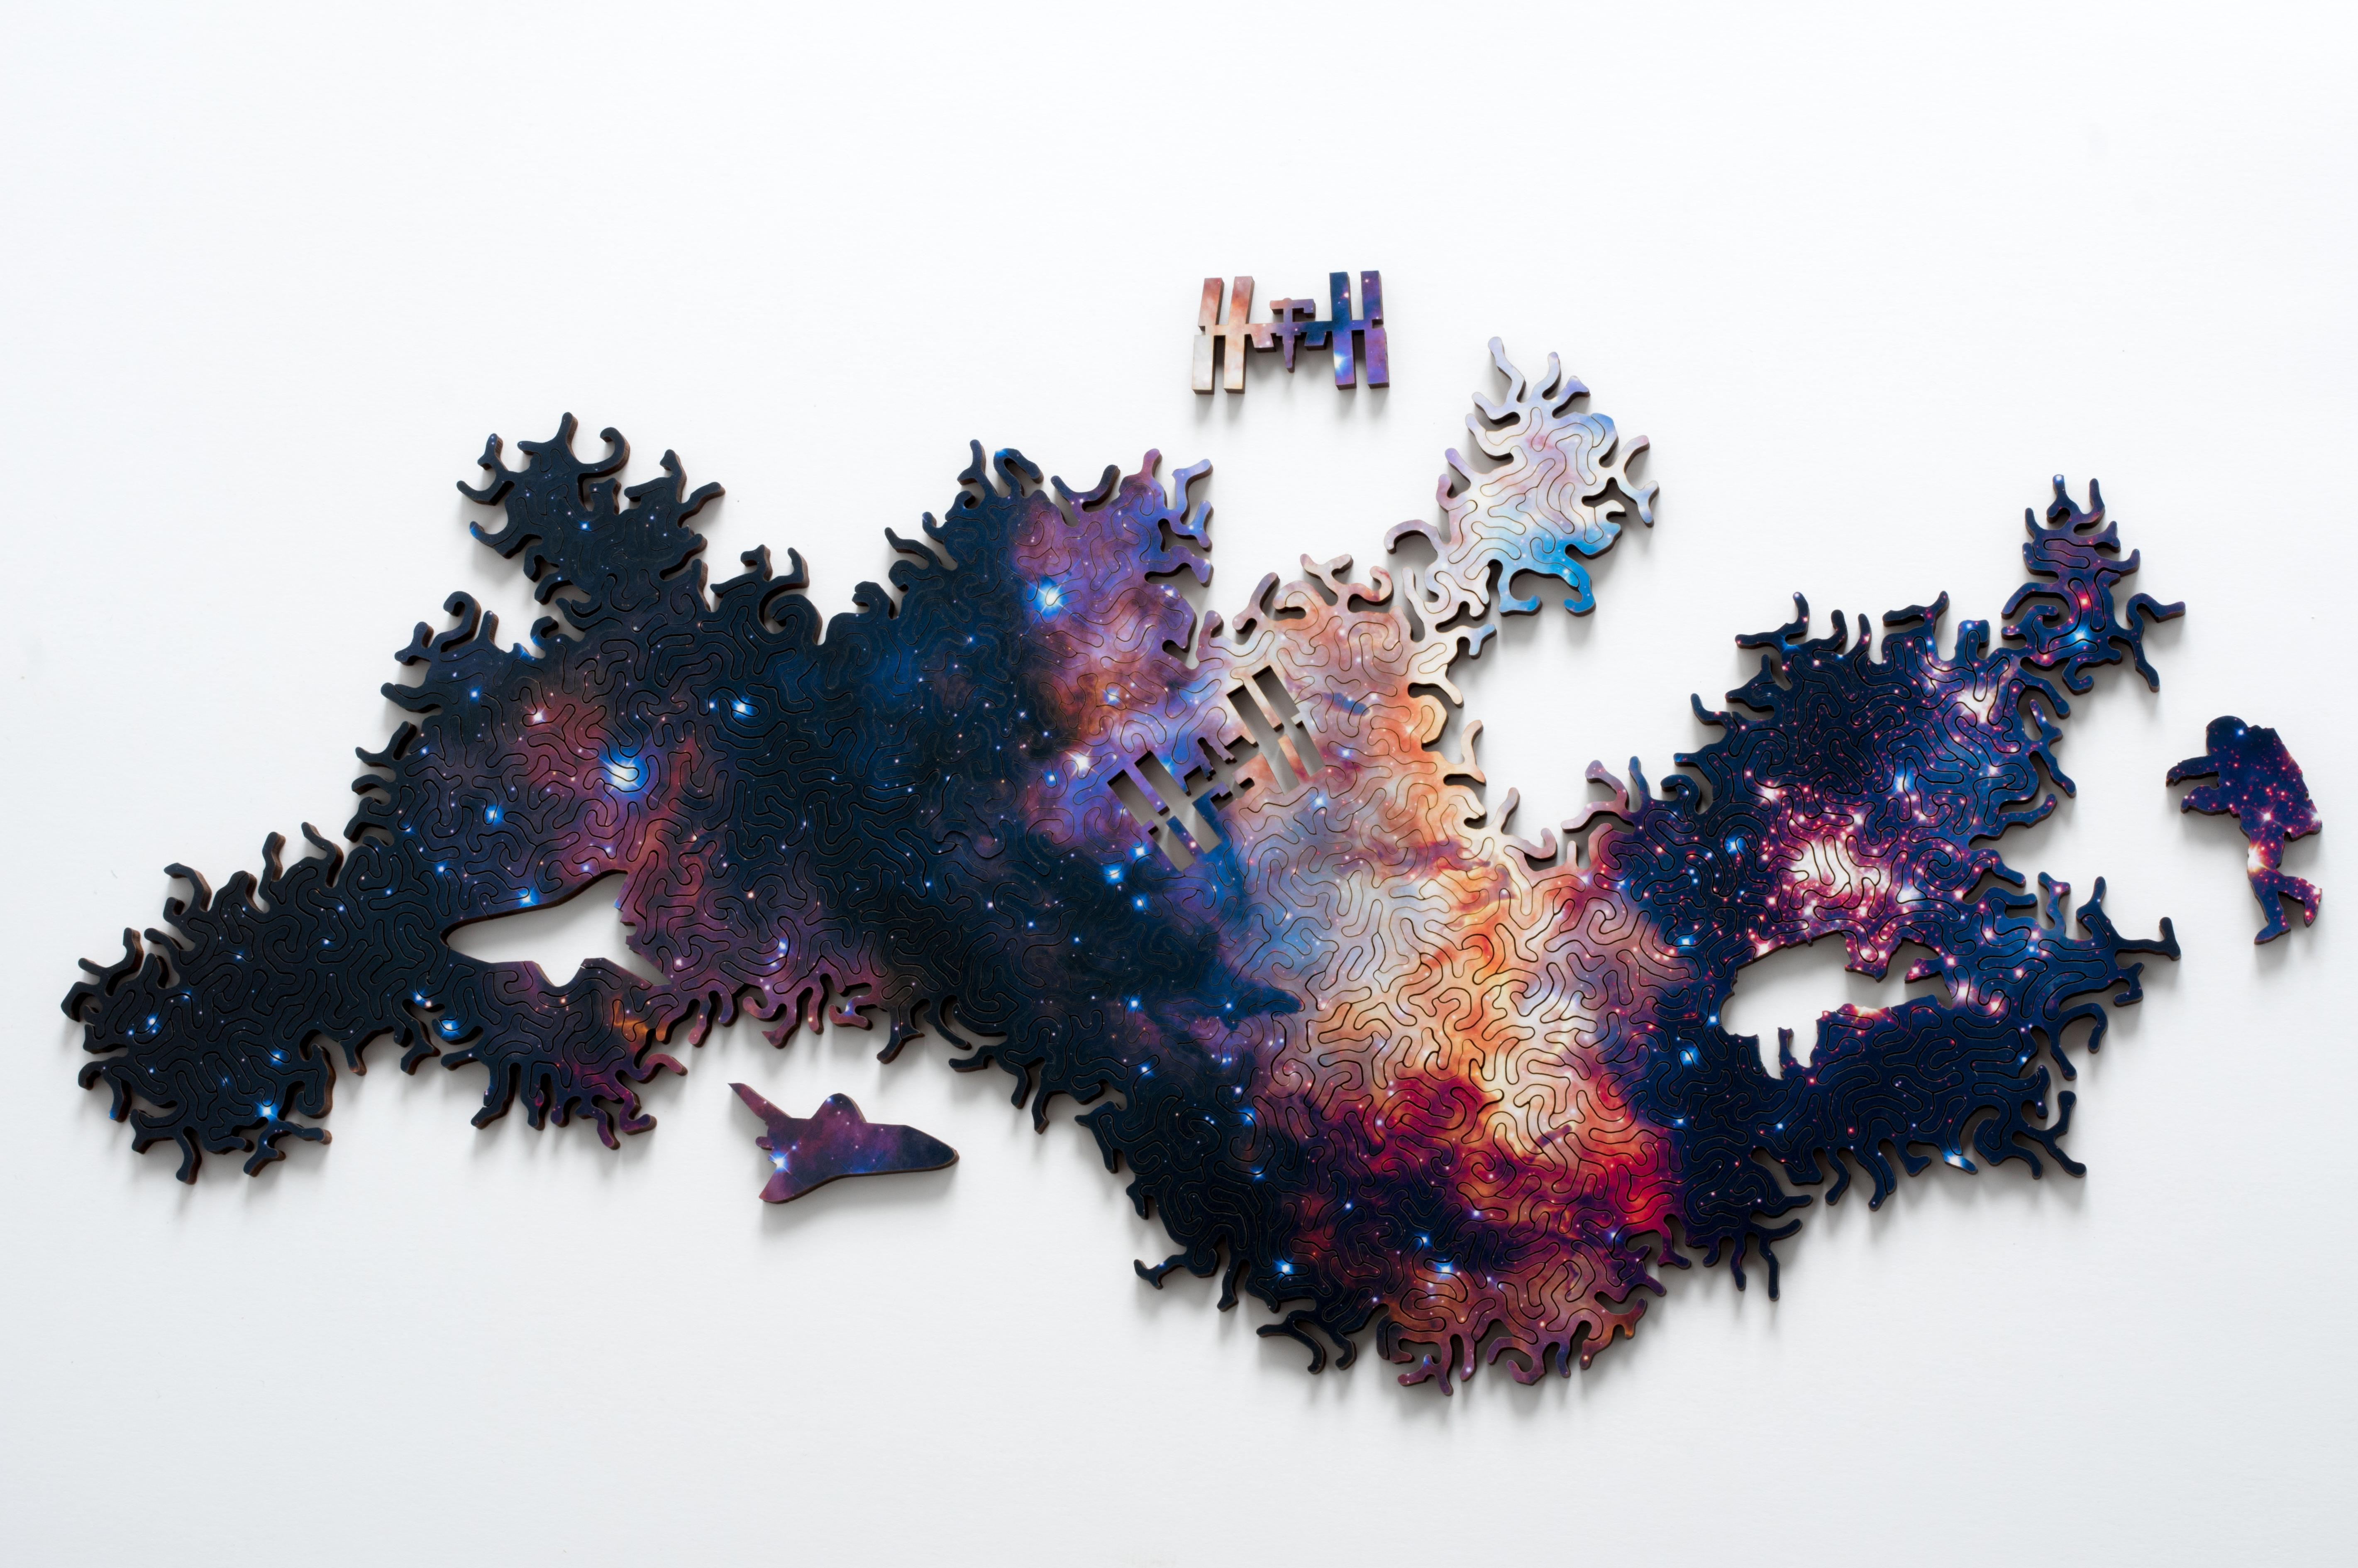 Infinite Galaxy Puzzle 2